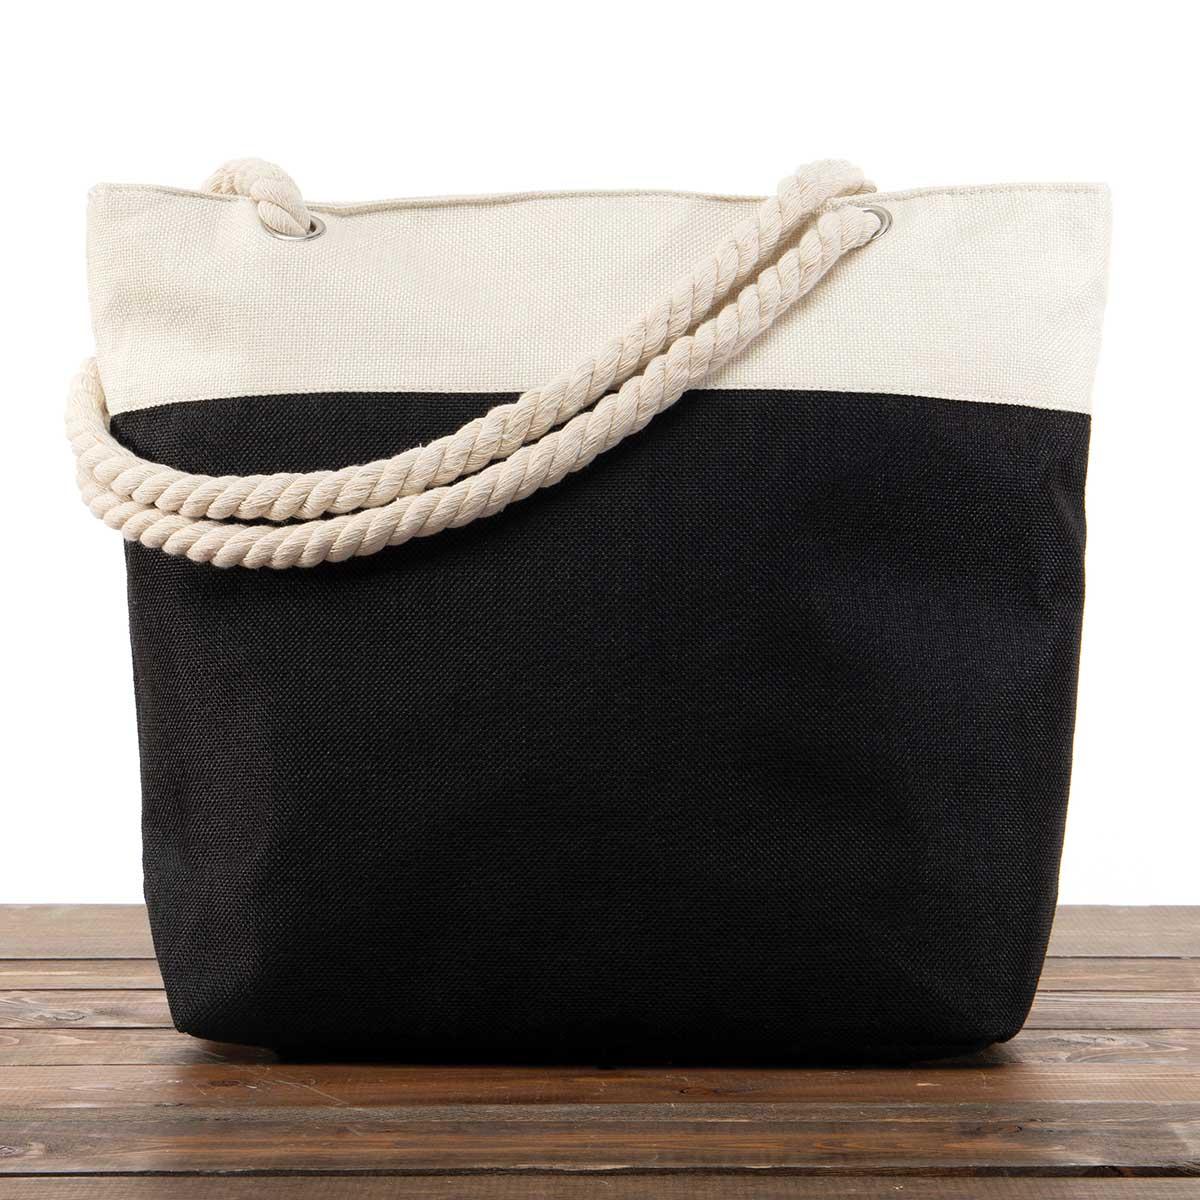 "Black Canvas Summer Bag 17.5""x5""x14"" with 10"" Rope Shoulder Stra"